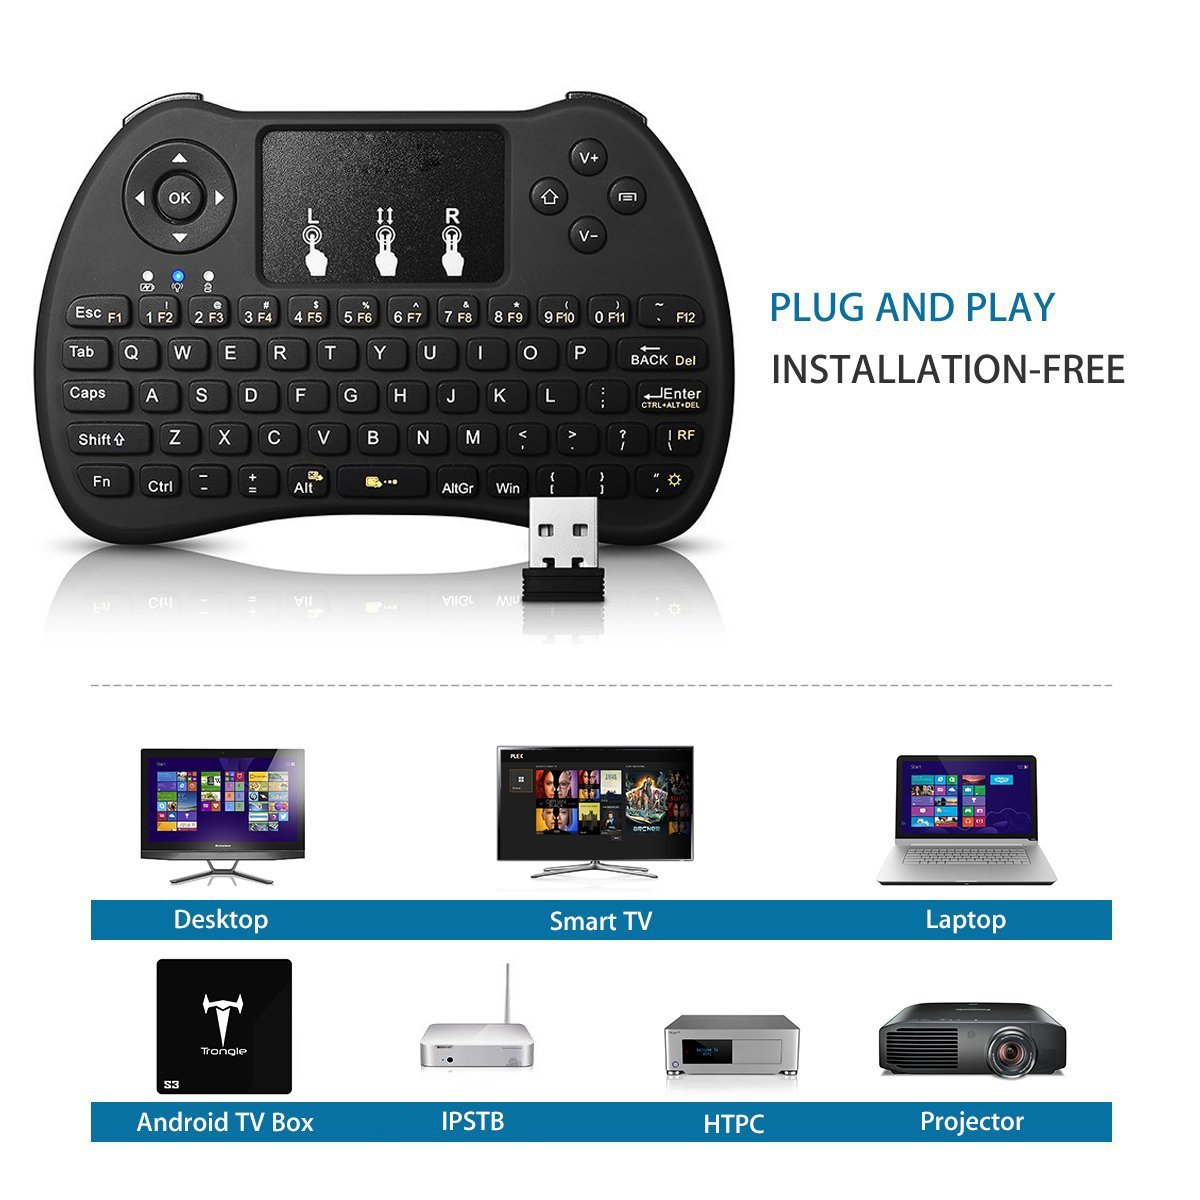 Seguro 2.4 GHz Mini teclado inalámbrico Touchpad Combo, Negro: Amazon.es: Bebé